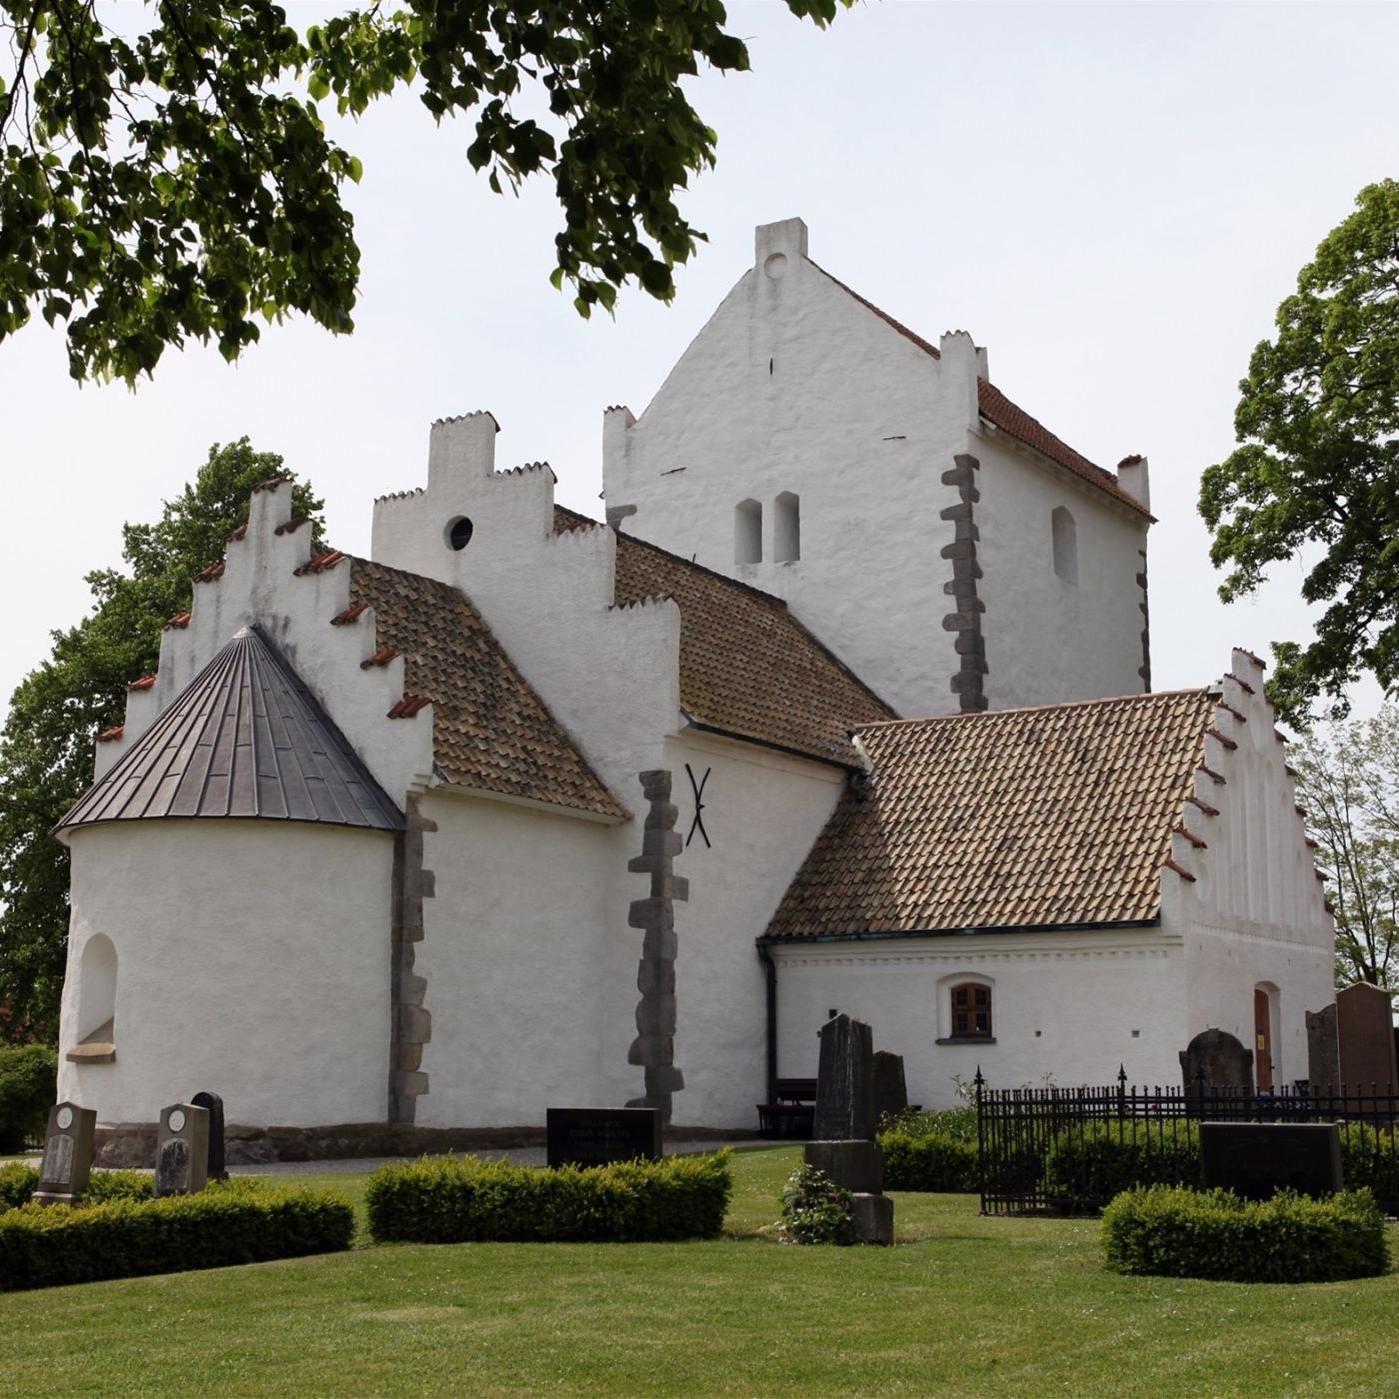 Kävlinge Old church